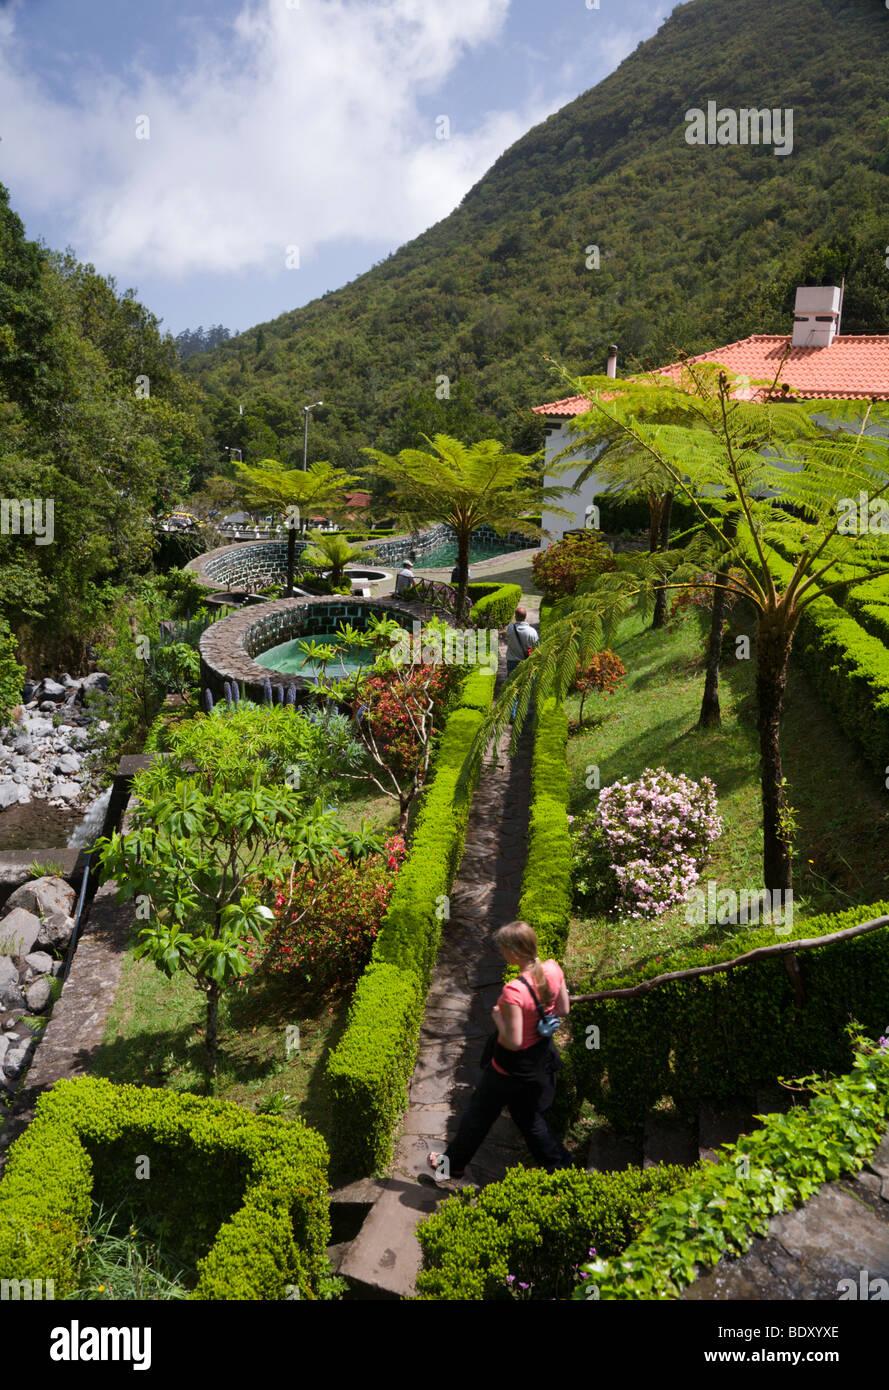 Botanical gardens at the trout farm in Ribeiro Frio, Madeira. - Stock Image